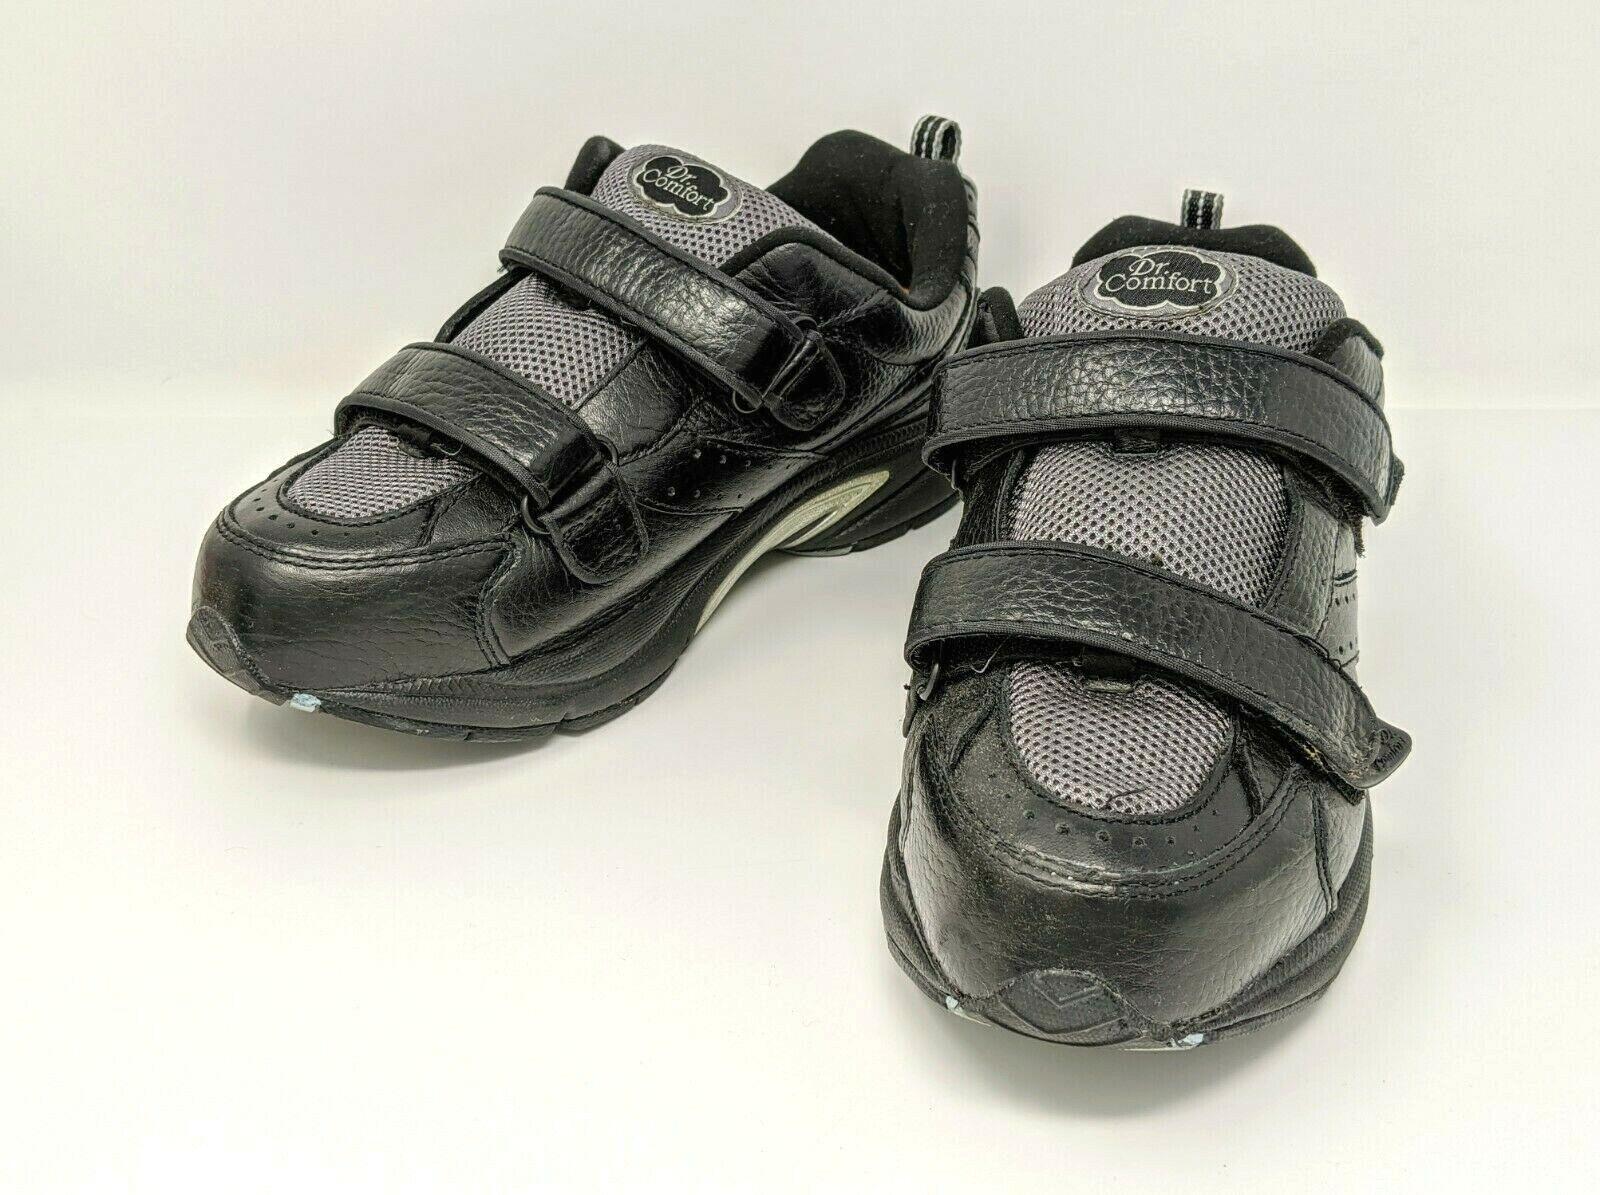 Dr Comfort - Spirit X Depth (2410) - Black Diabetic Comfort Shoes - Women's US 9